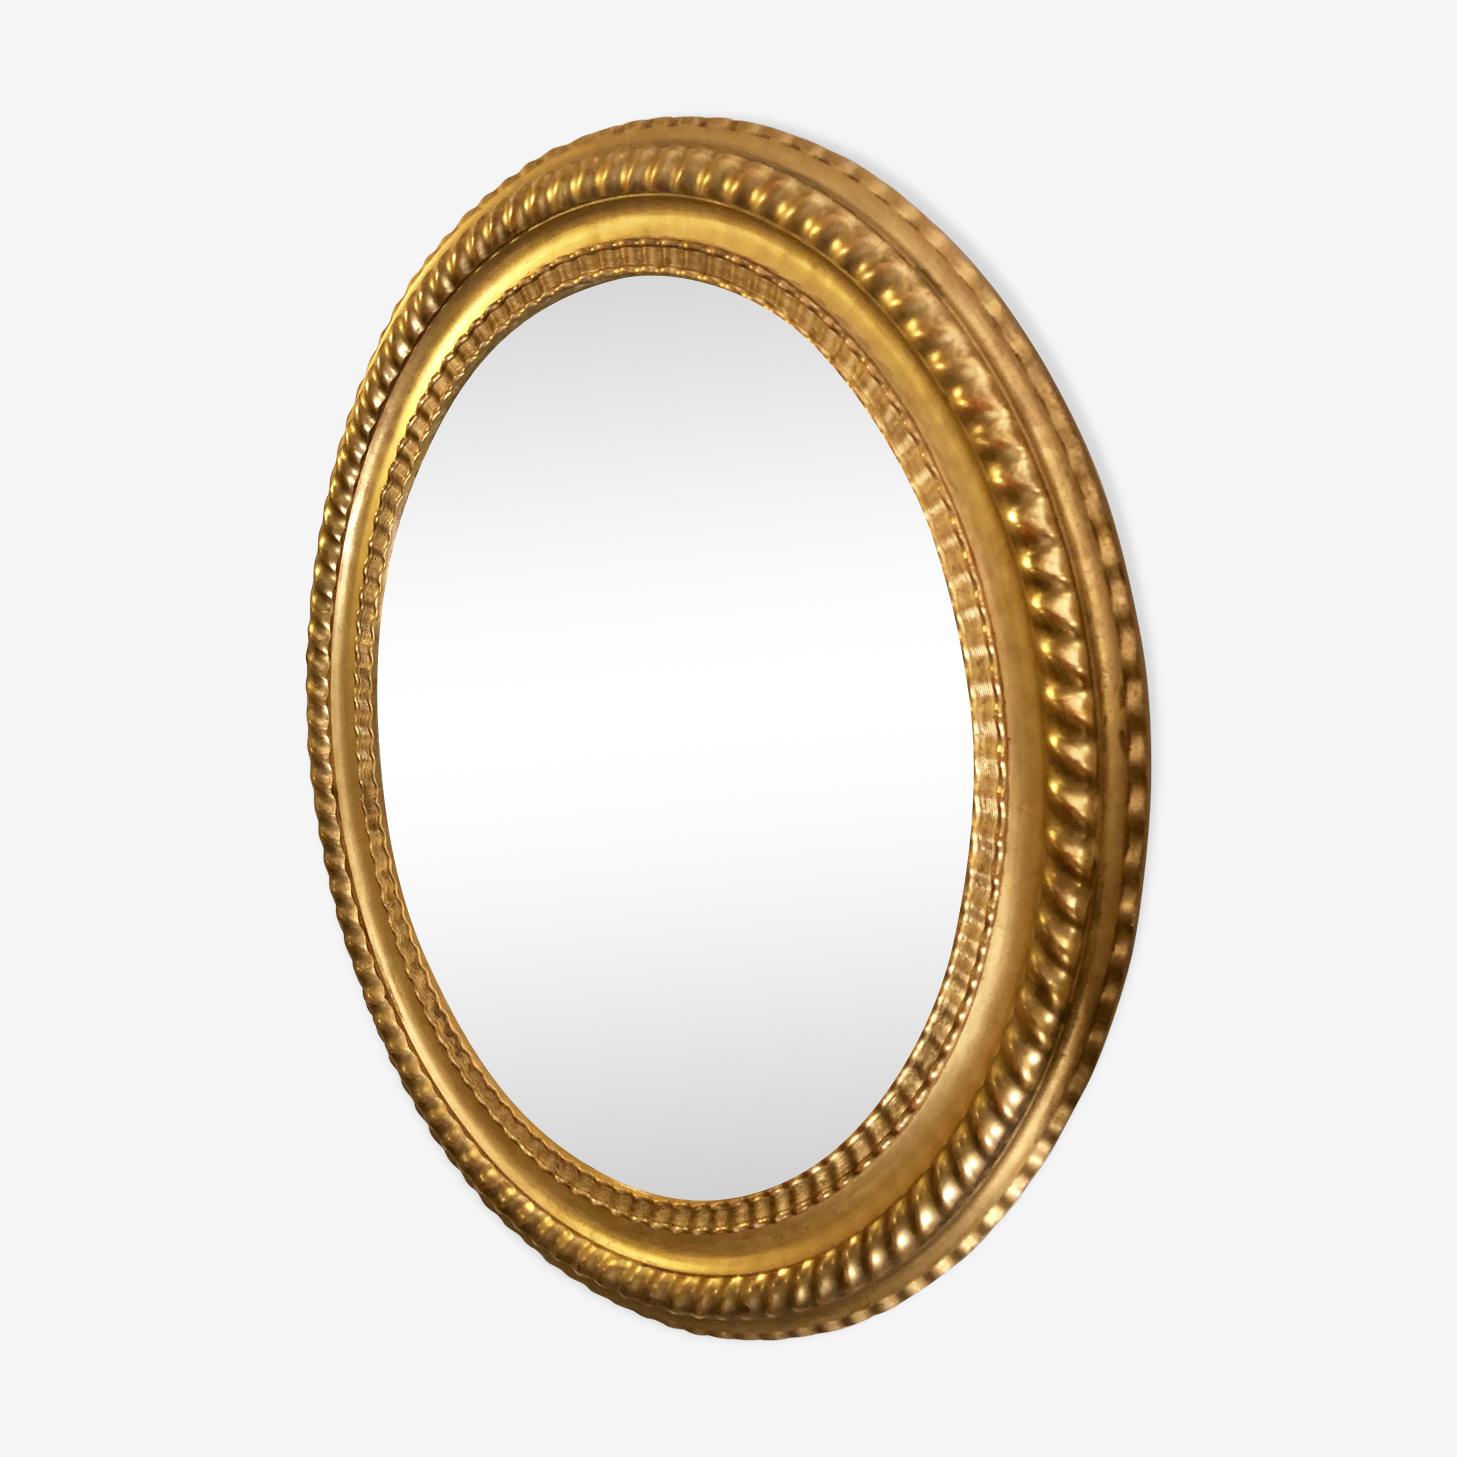 Oval mirror 82 X 72 gilding sheet d gold time XIX th